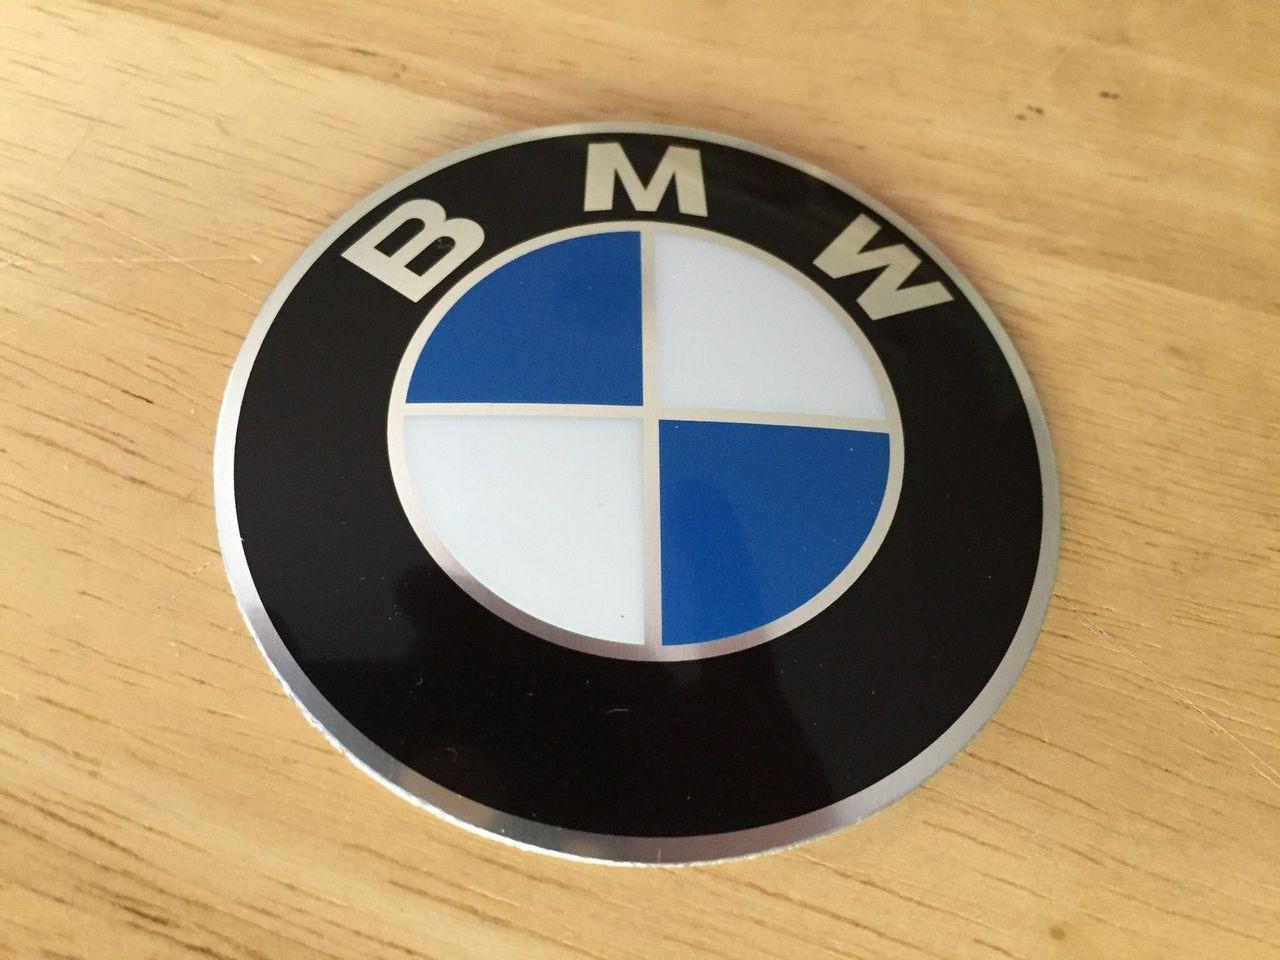 VINTAGE BMW TANK+SEAT COWL EMBLEM FITS R60/6-R100RT TANK AND REAR SEAT COWL  70MM - 16 11 1 232 908 & 46 63 7 686 746